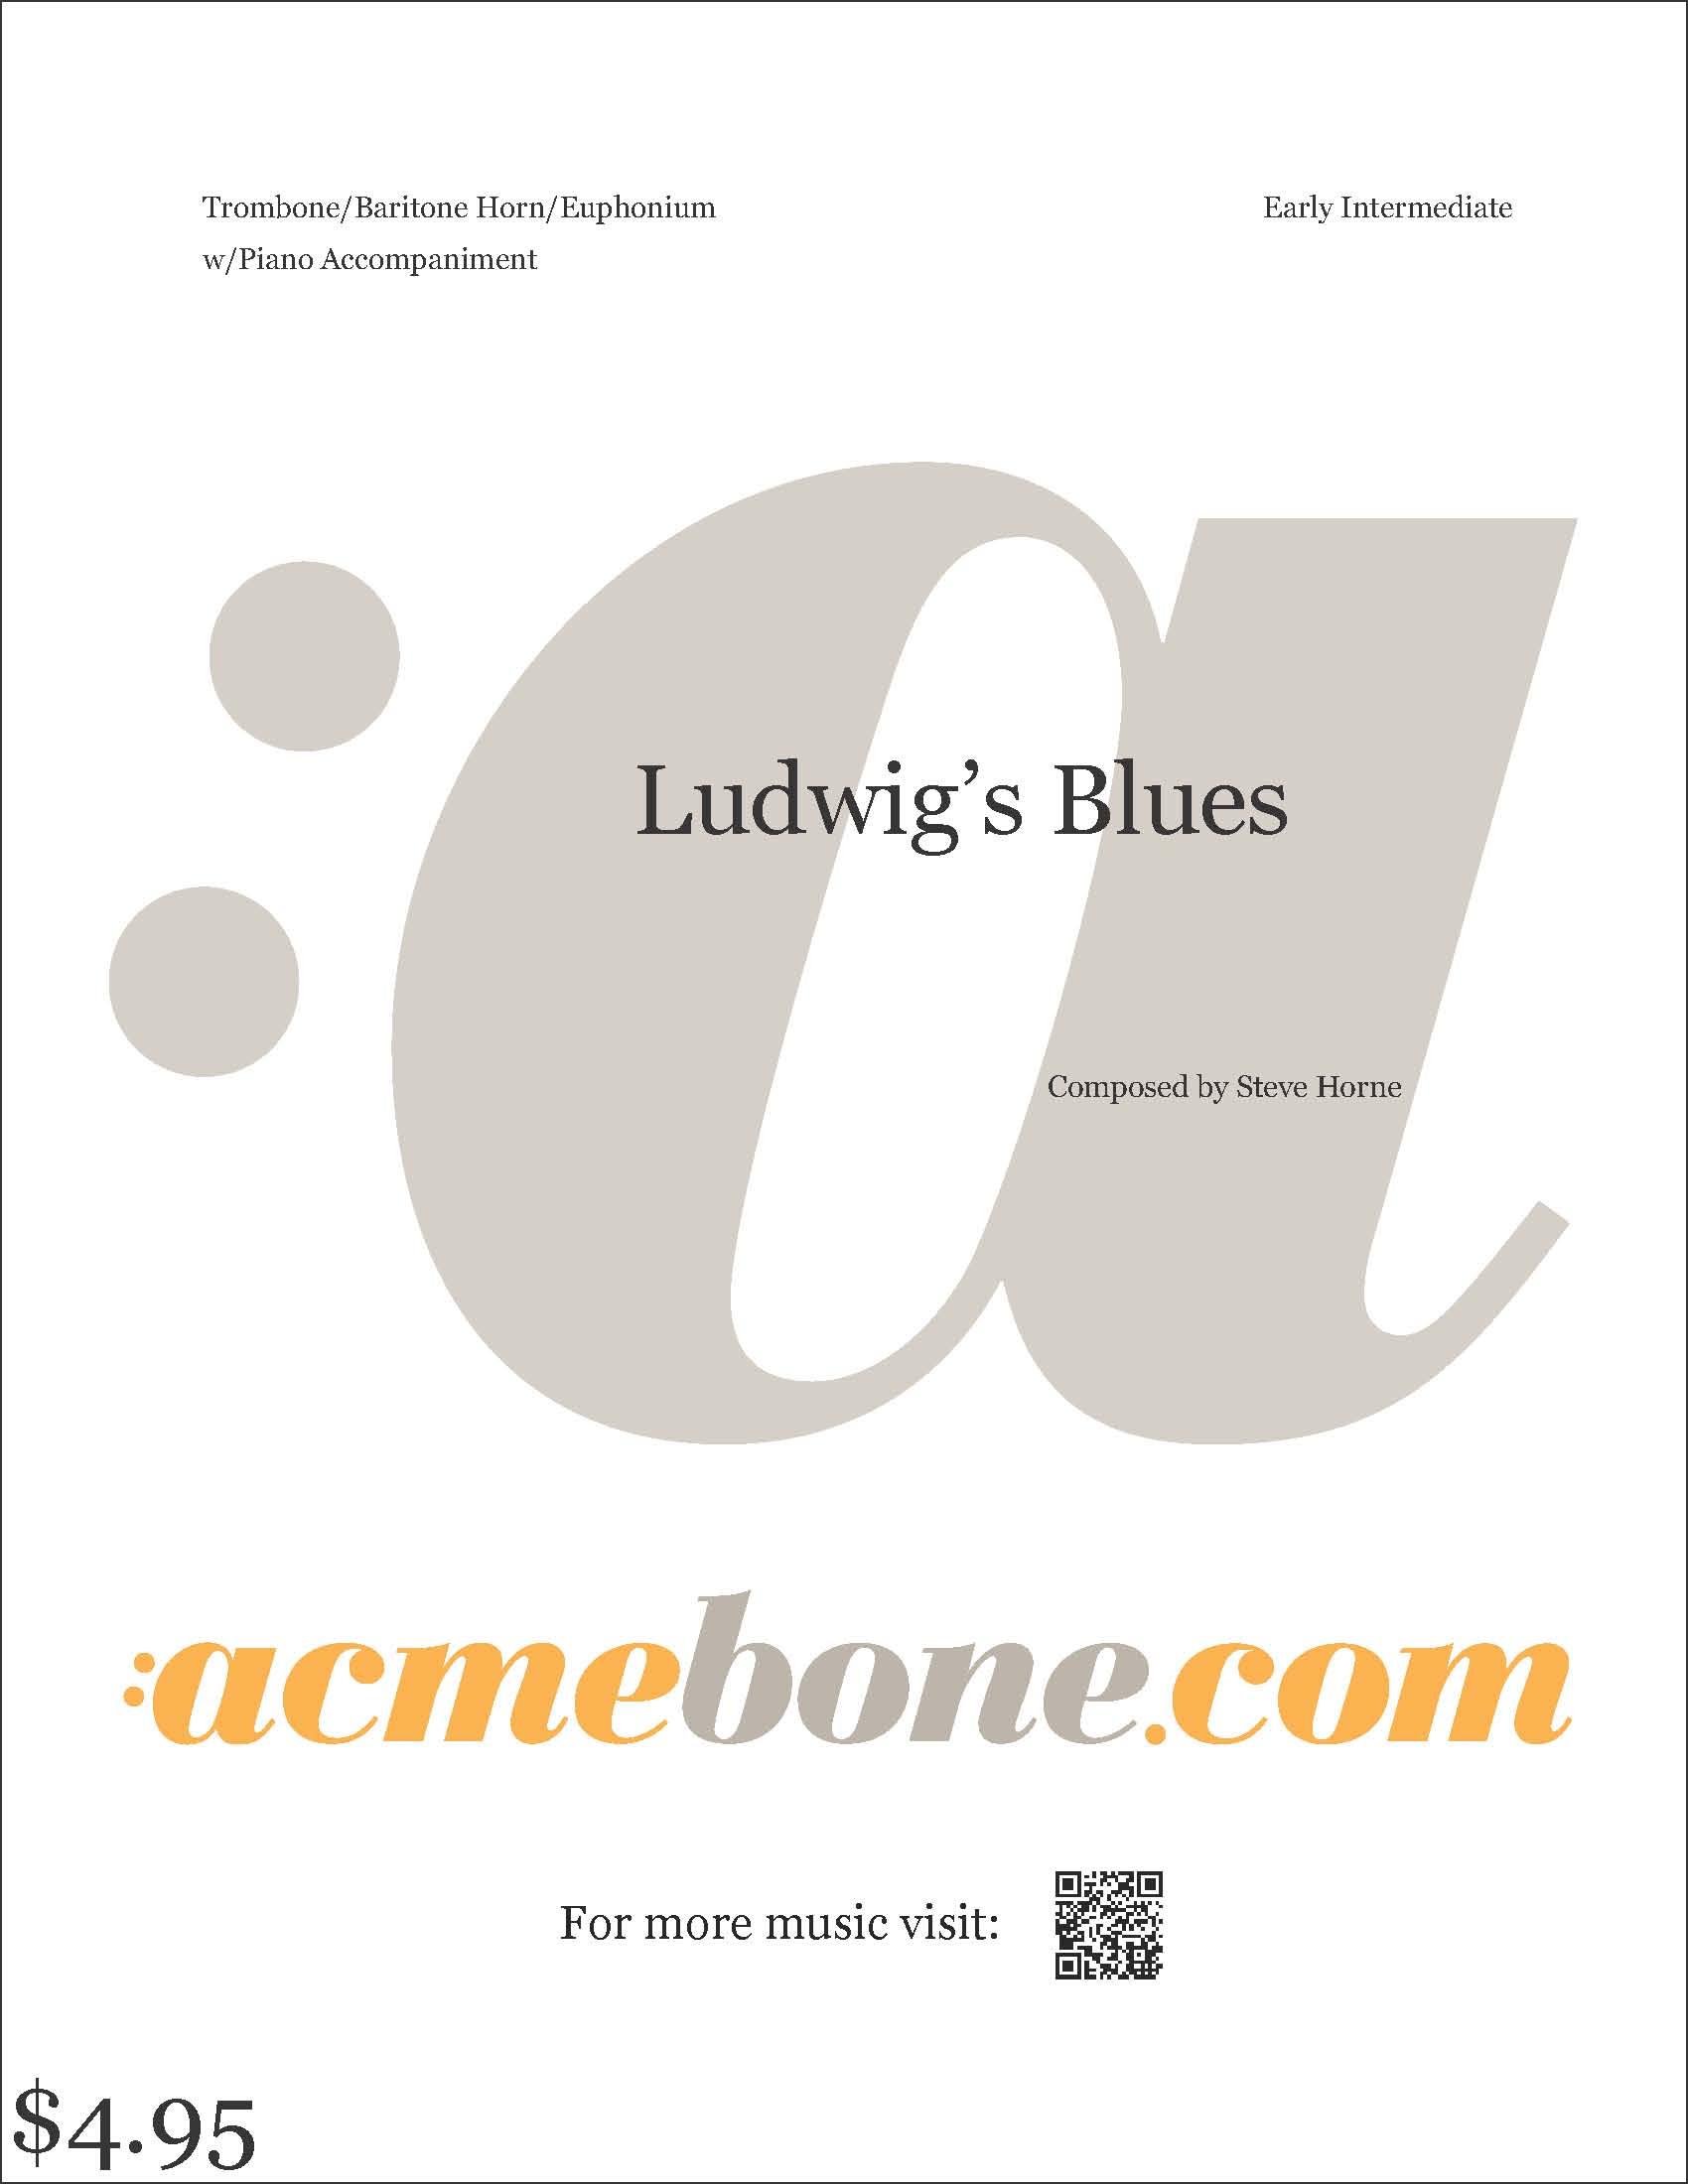 Ludwig's Blues_digital_cover_w-bo_price.jpg